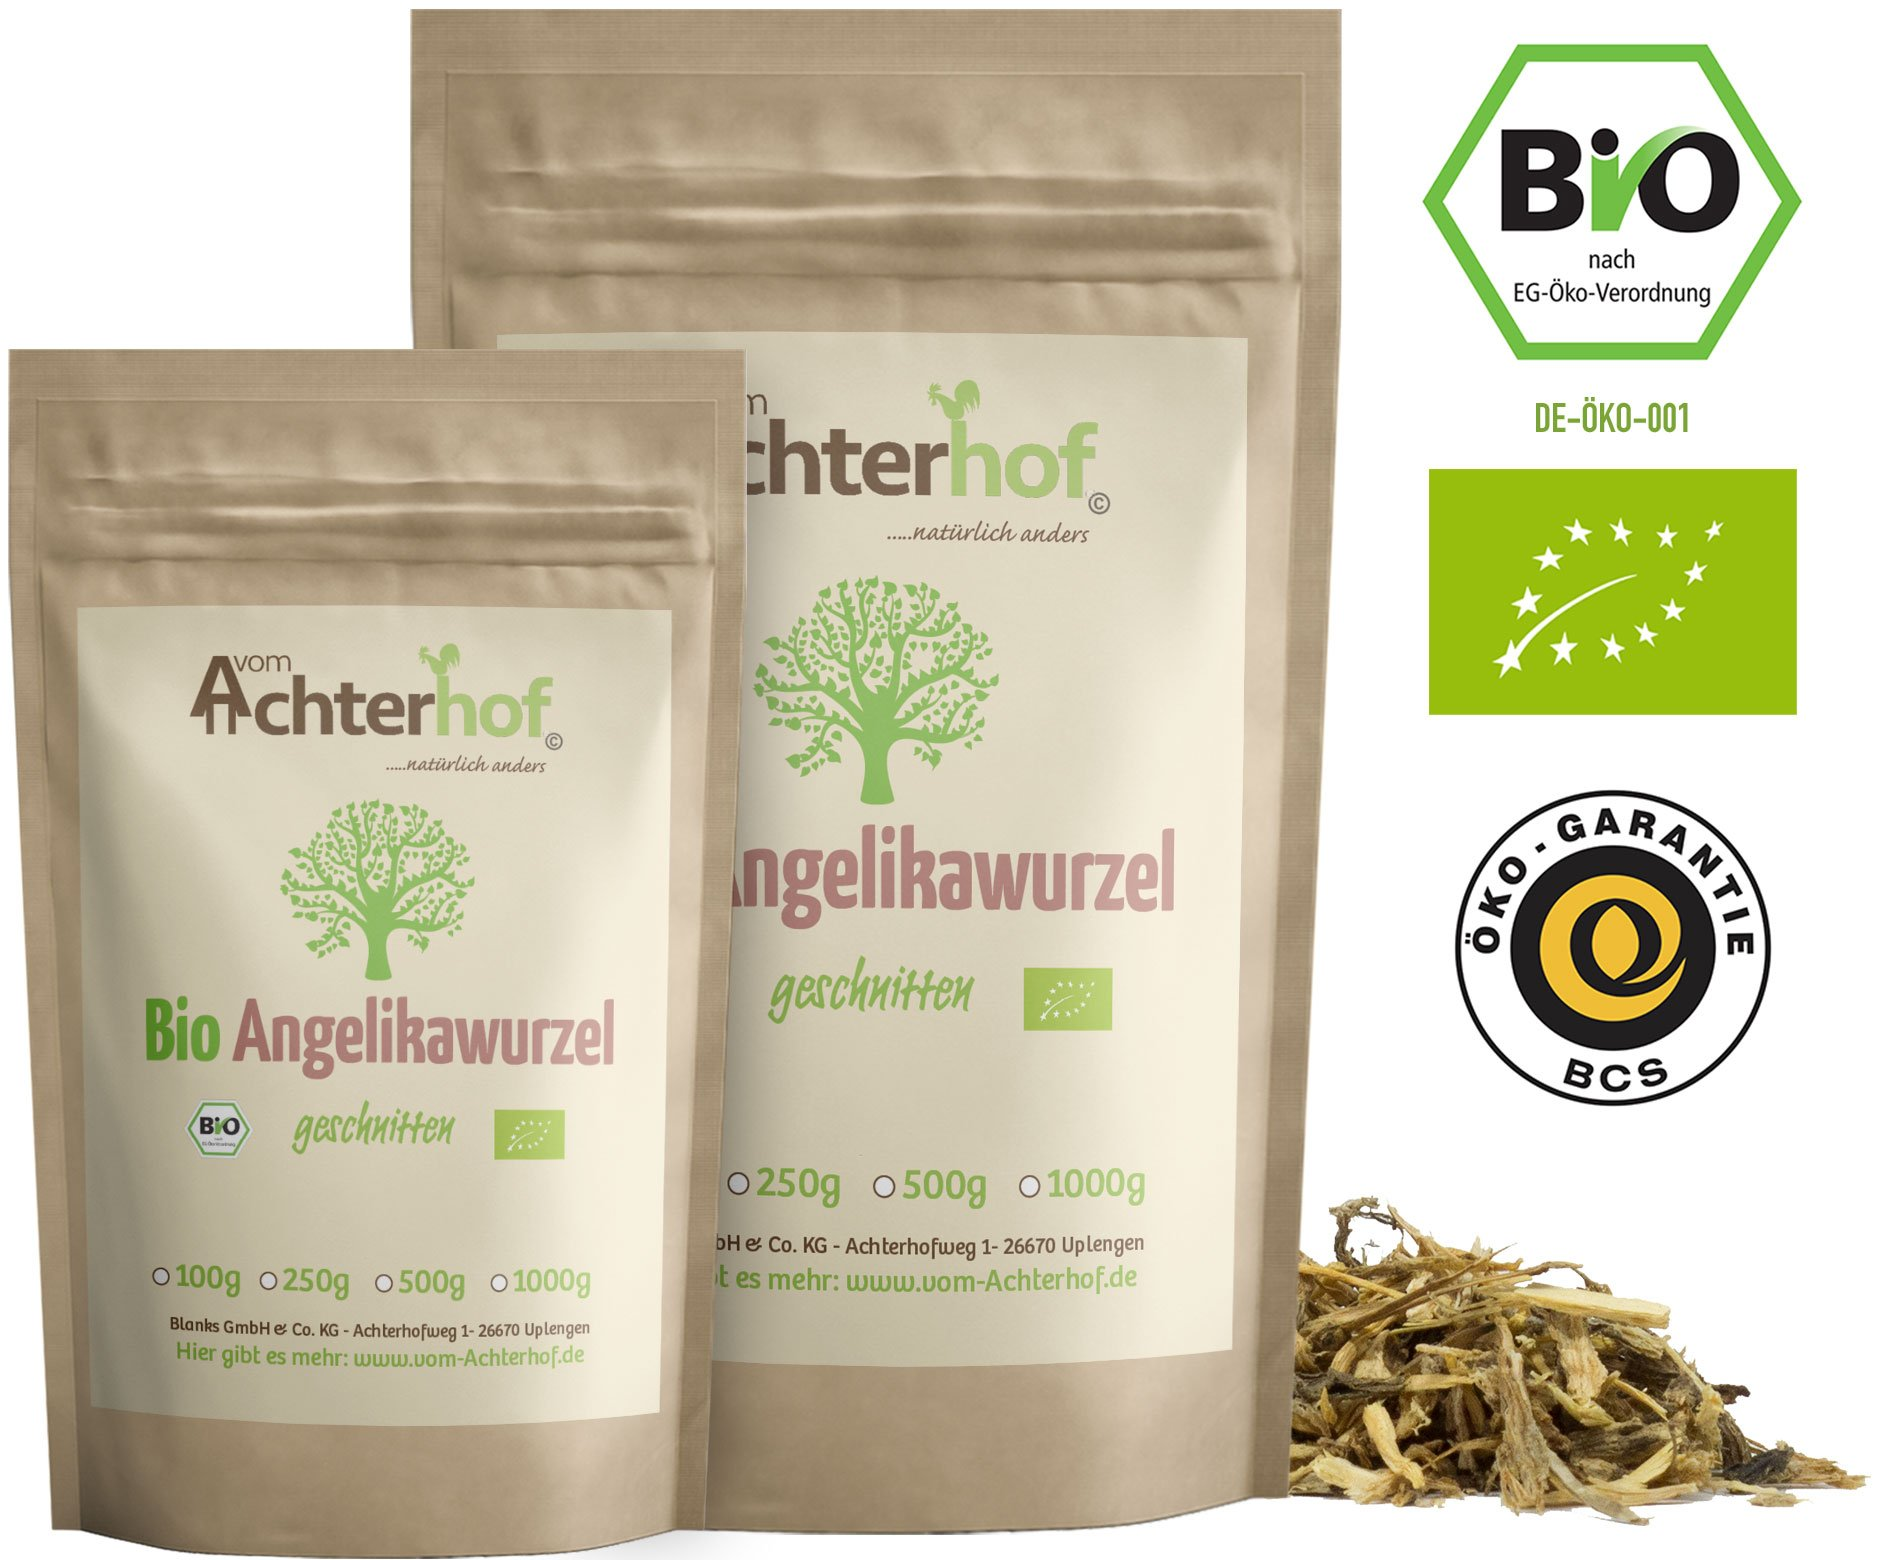 Angelikawurzel-BIO-100g-geschnitten-Engelwurz-Angelikawurzeltee-Angelica-Archangelica-Roots-organic-vom-Achterhof